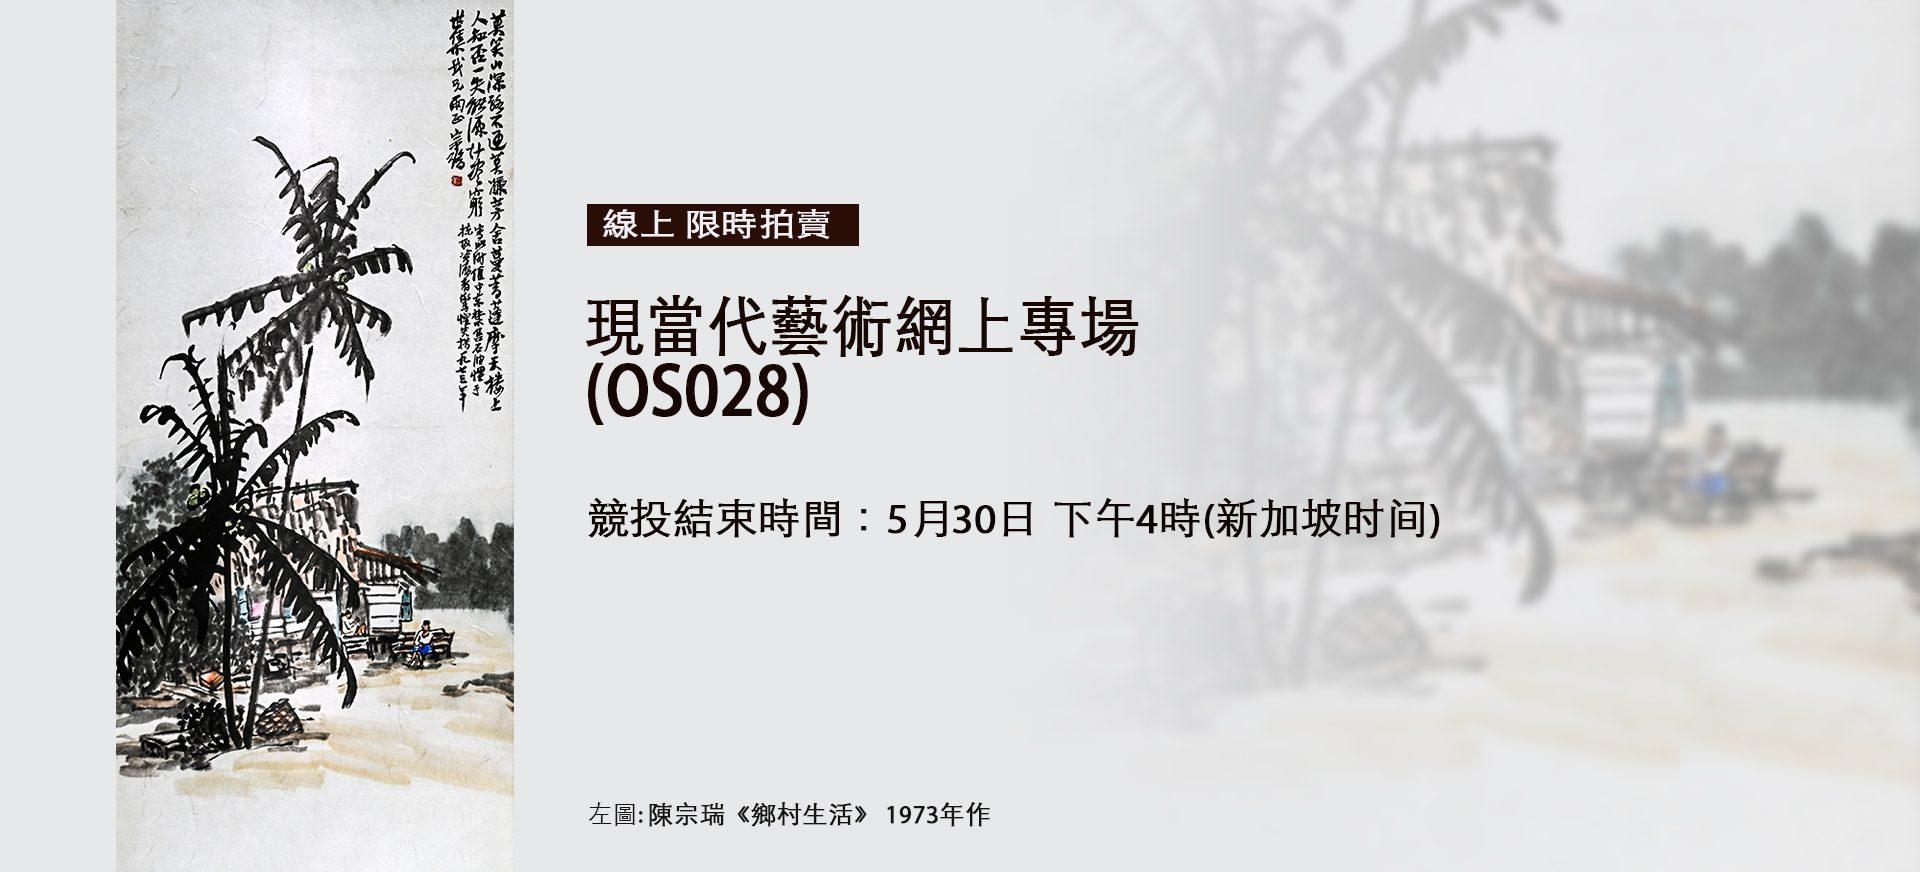 1920x872Banner_OS028-cn